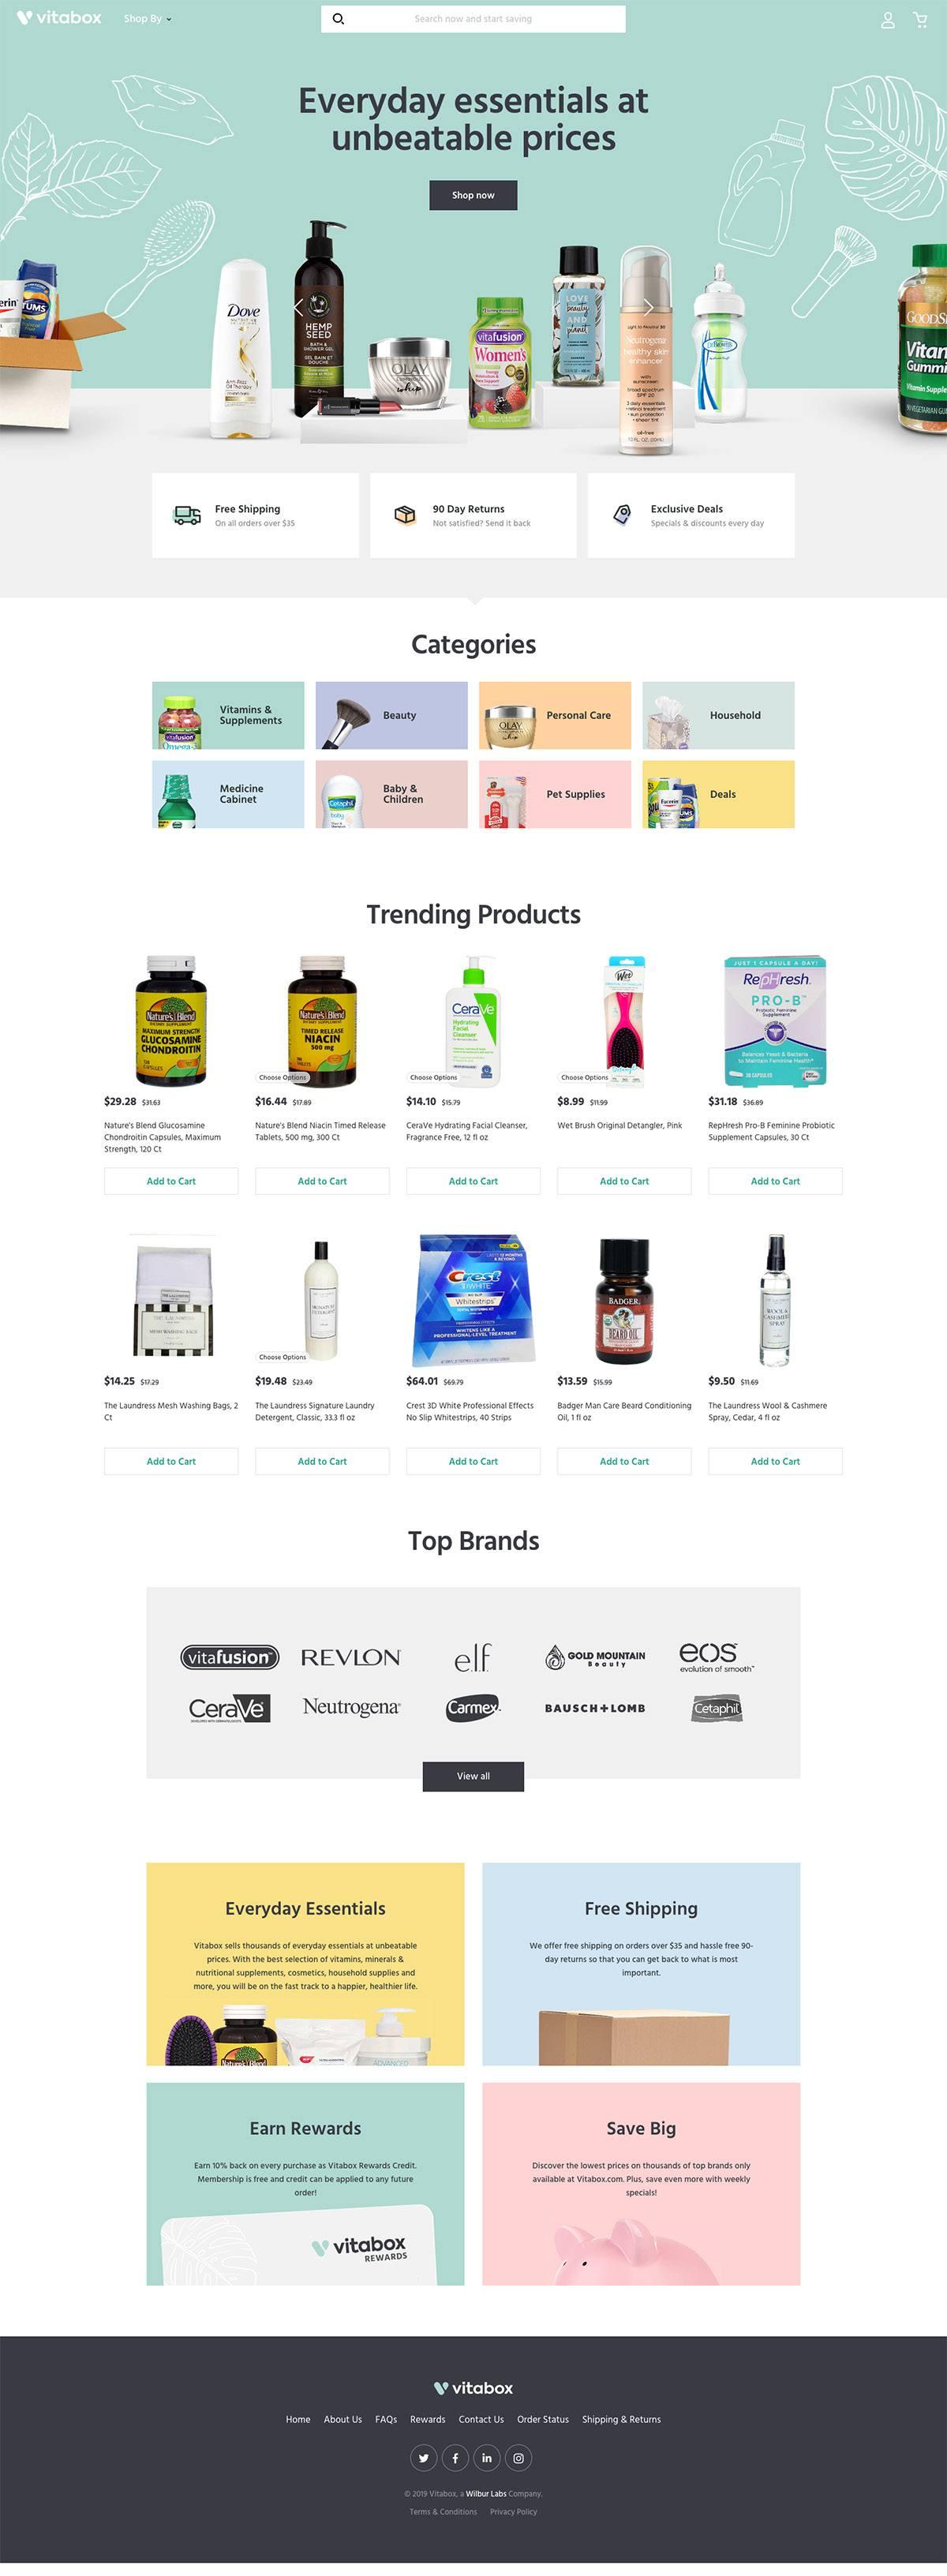 eCommerce website: Vitabox